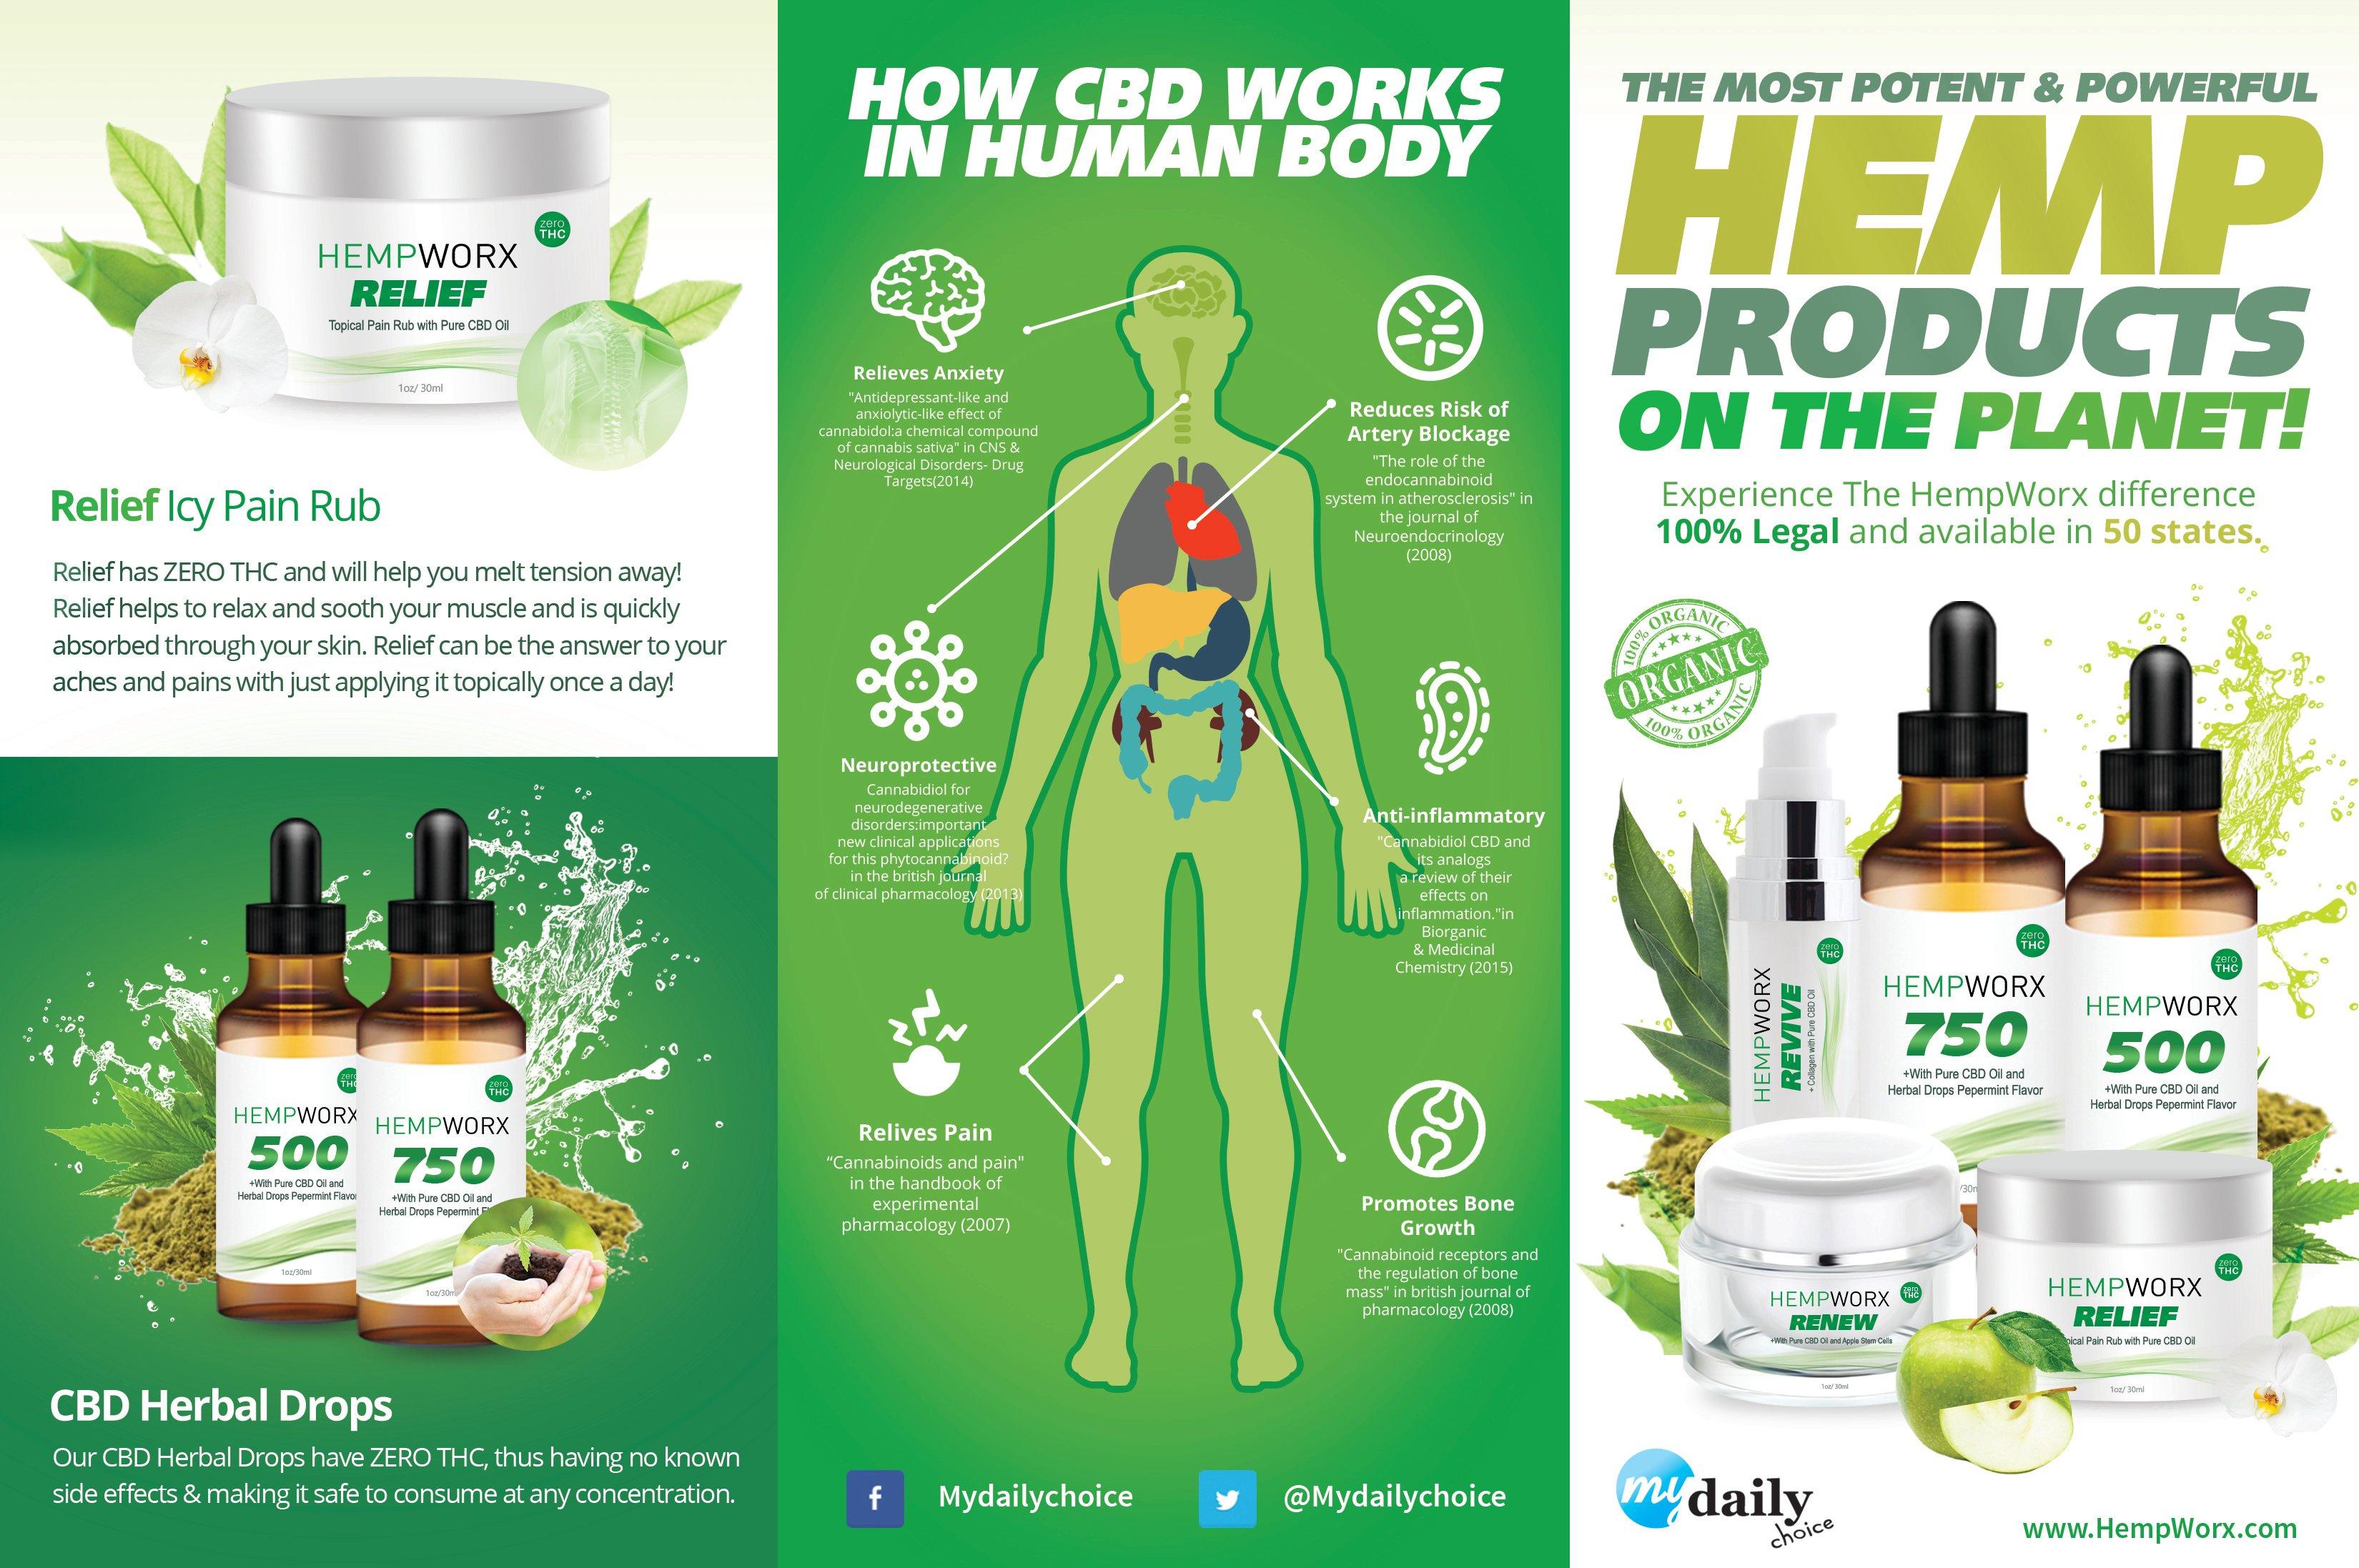 Hempworx THC Free Pure CBD Oil.